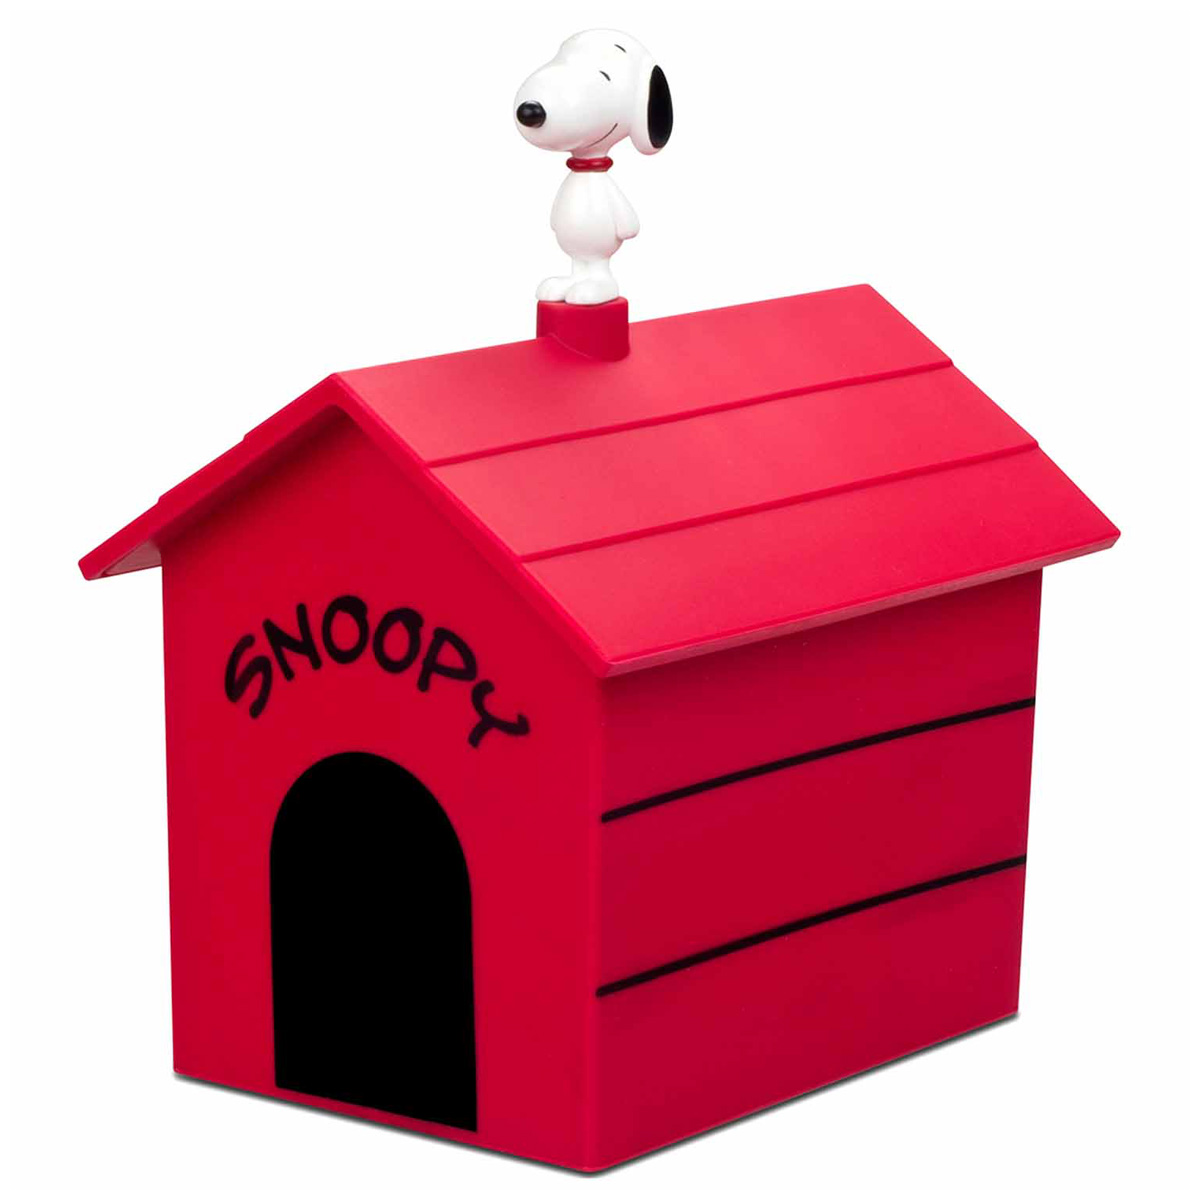 1200x1200 Snoopy Dog